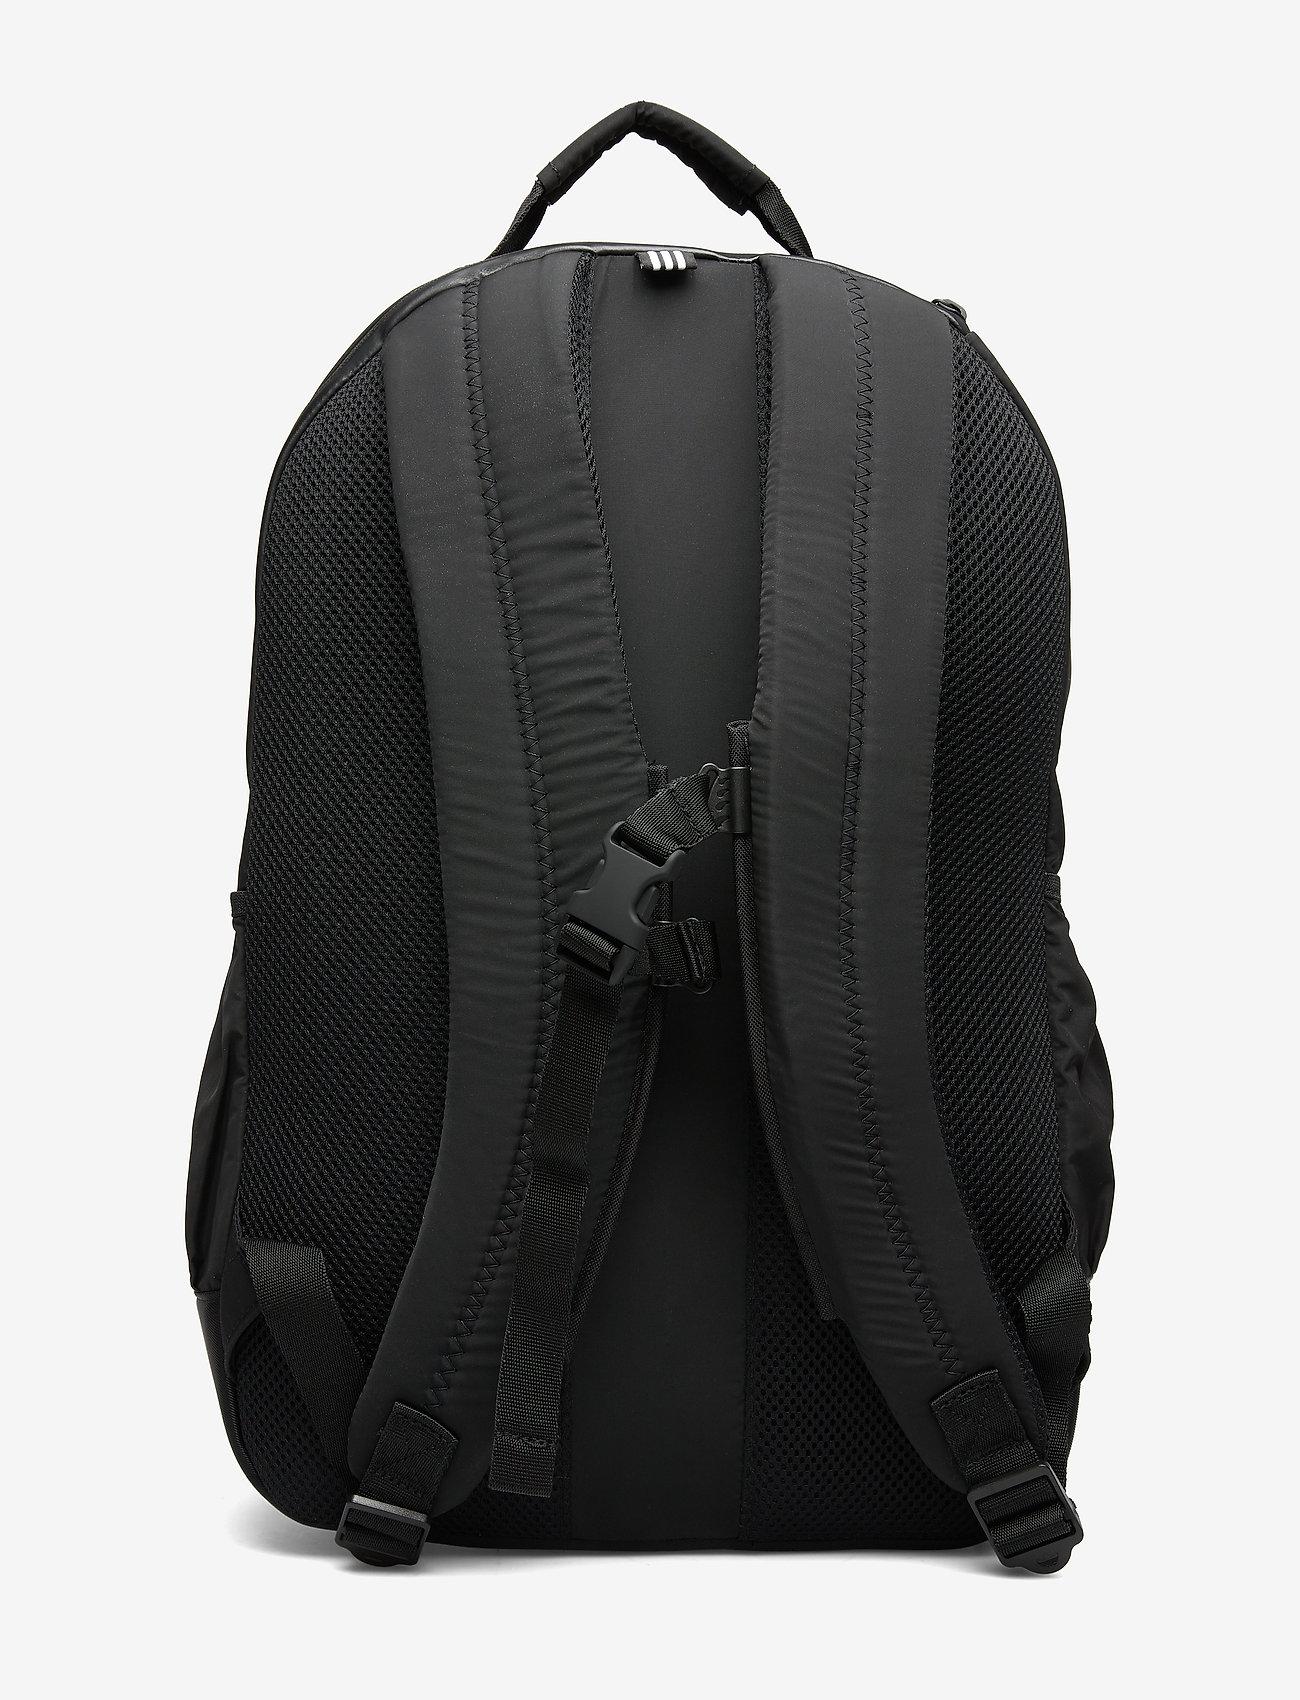 adidas Originals MODERN BACKPACK - Plecaki BLACK - Torby